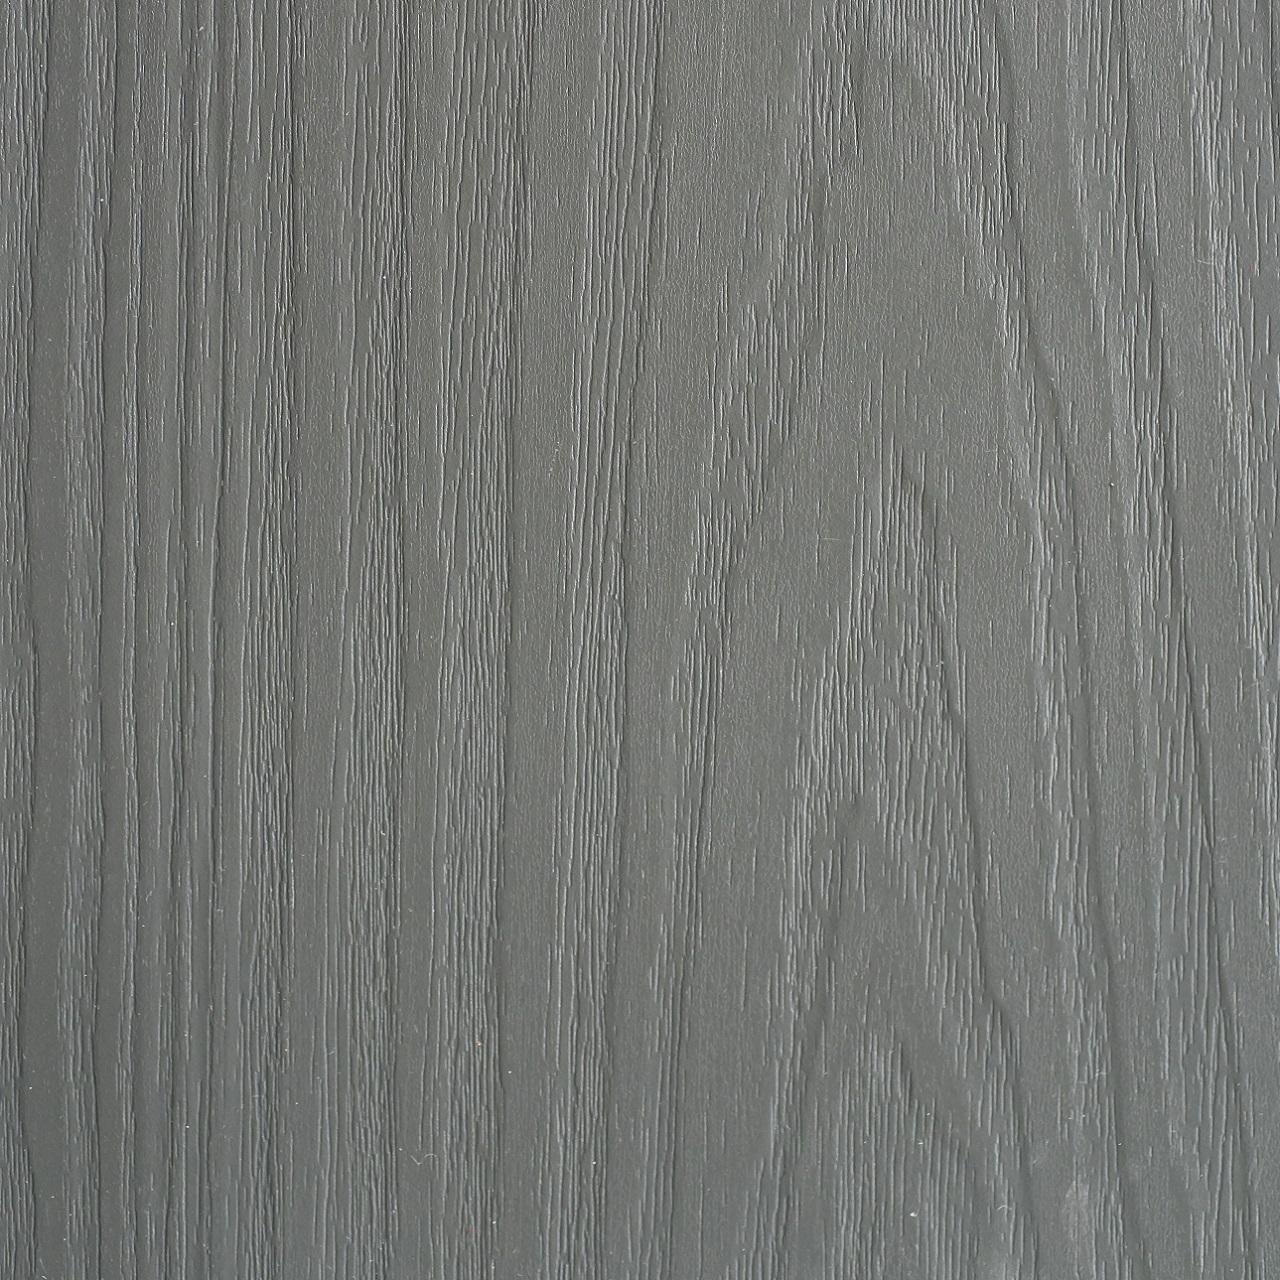 1160 Dark Grey-Millenium